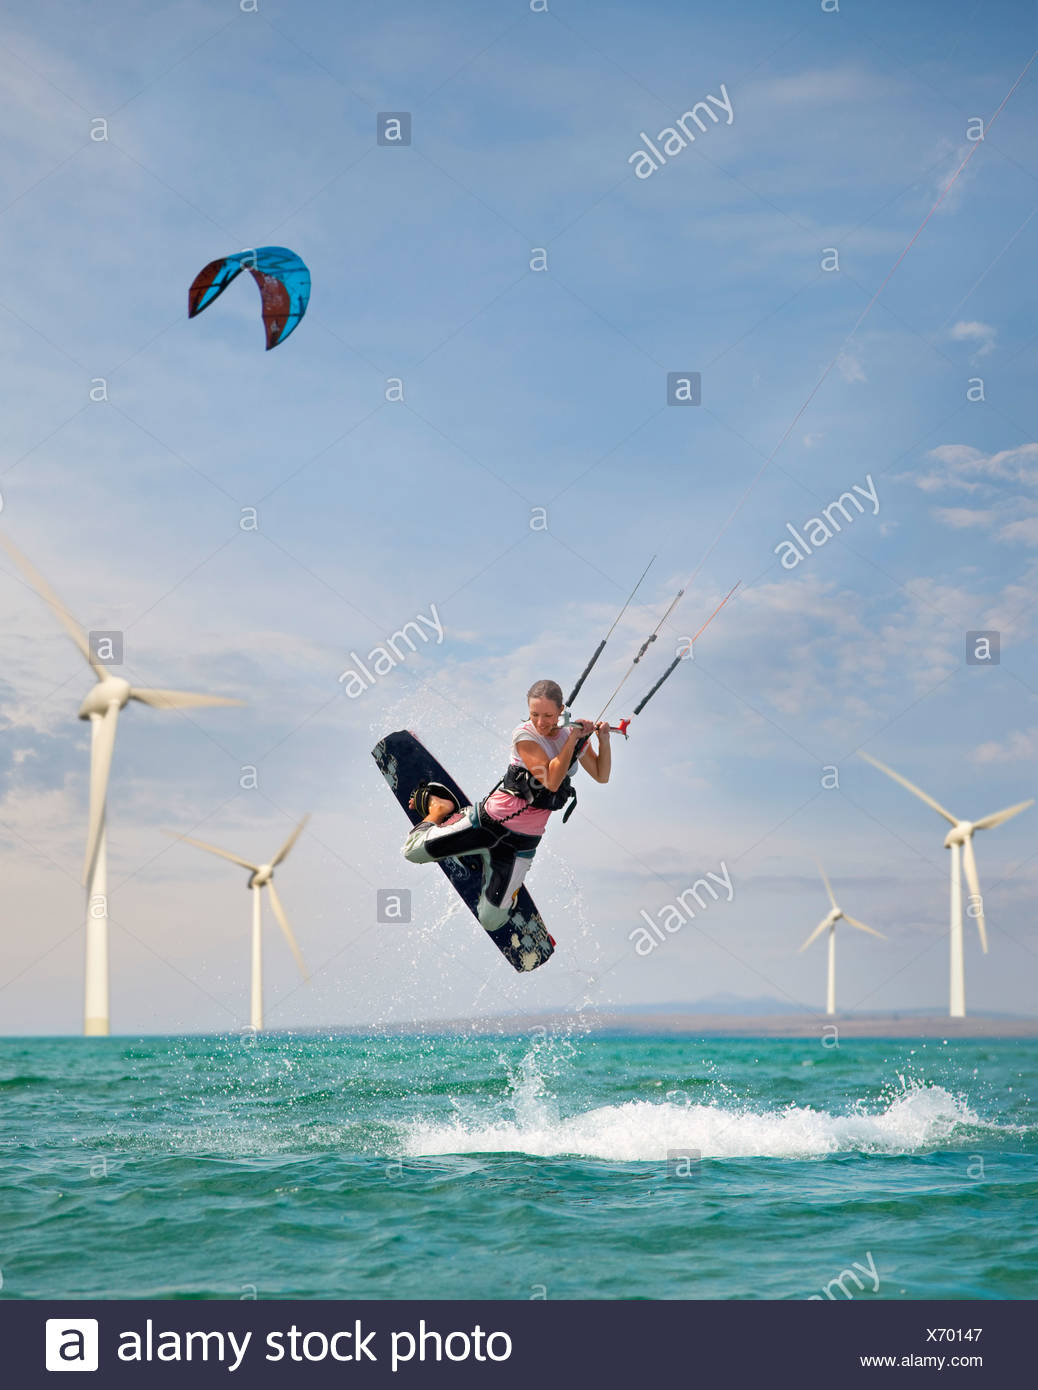 Croatia, Zadar, Kitesurfer jumping in front of wind turbine Stock Photo